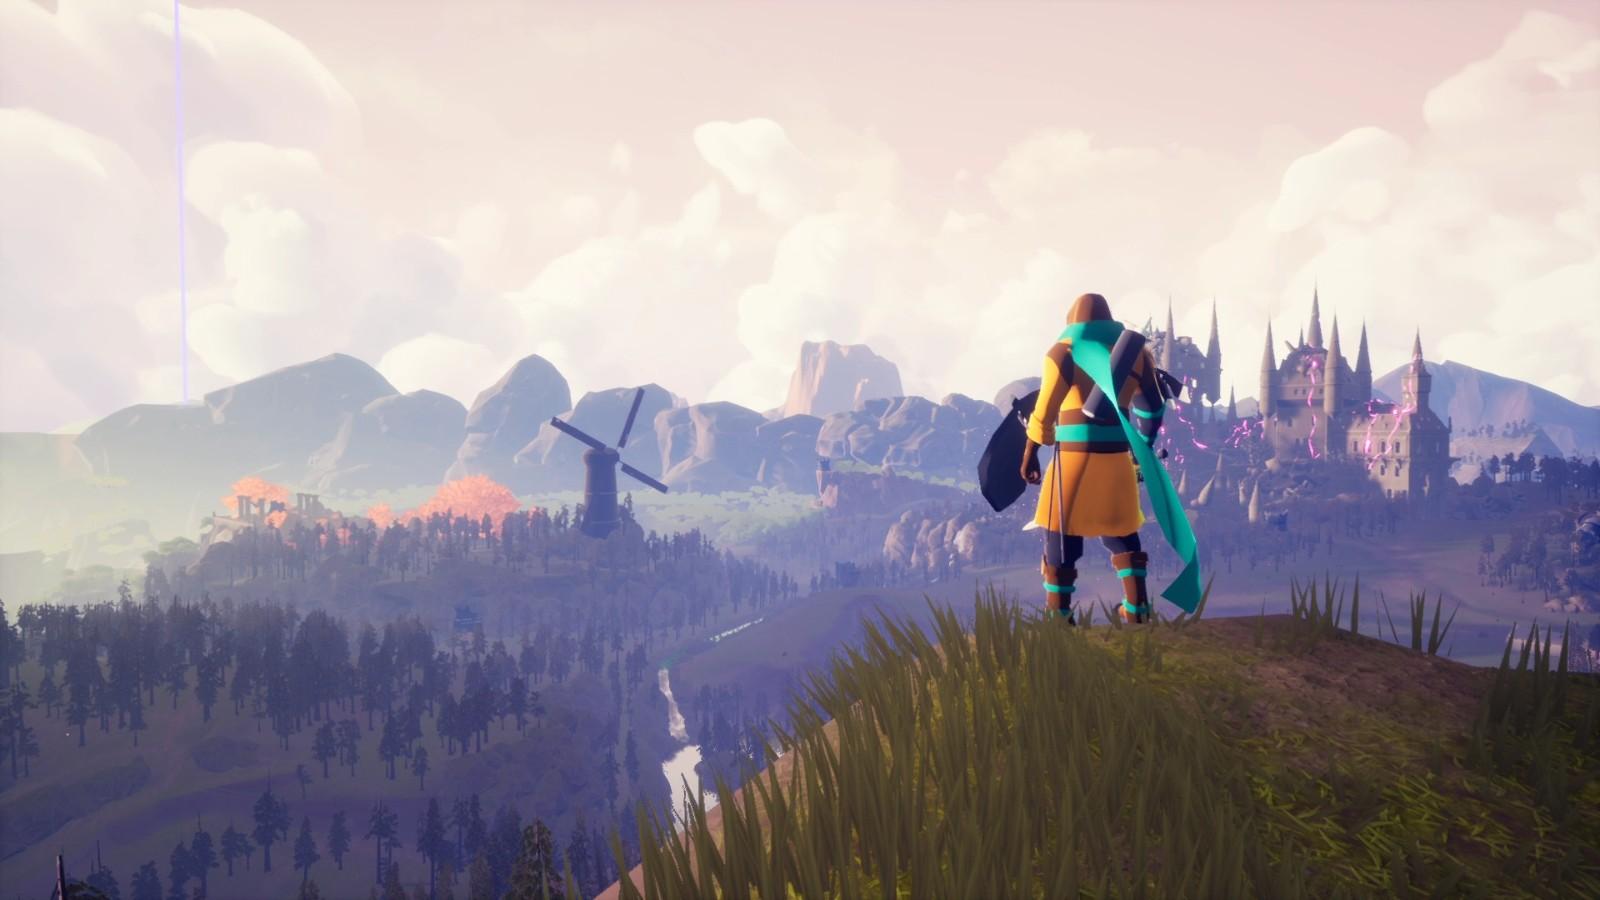 类魂新作《Holomento》上架Steam 目前已开放免费试玩Demo